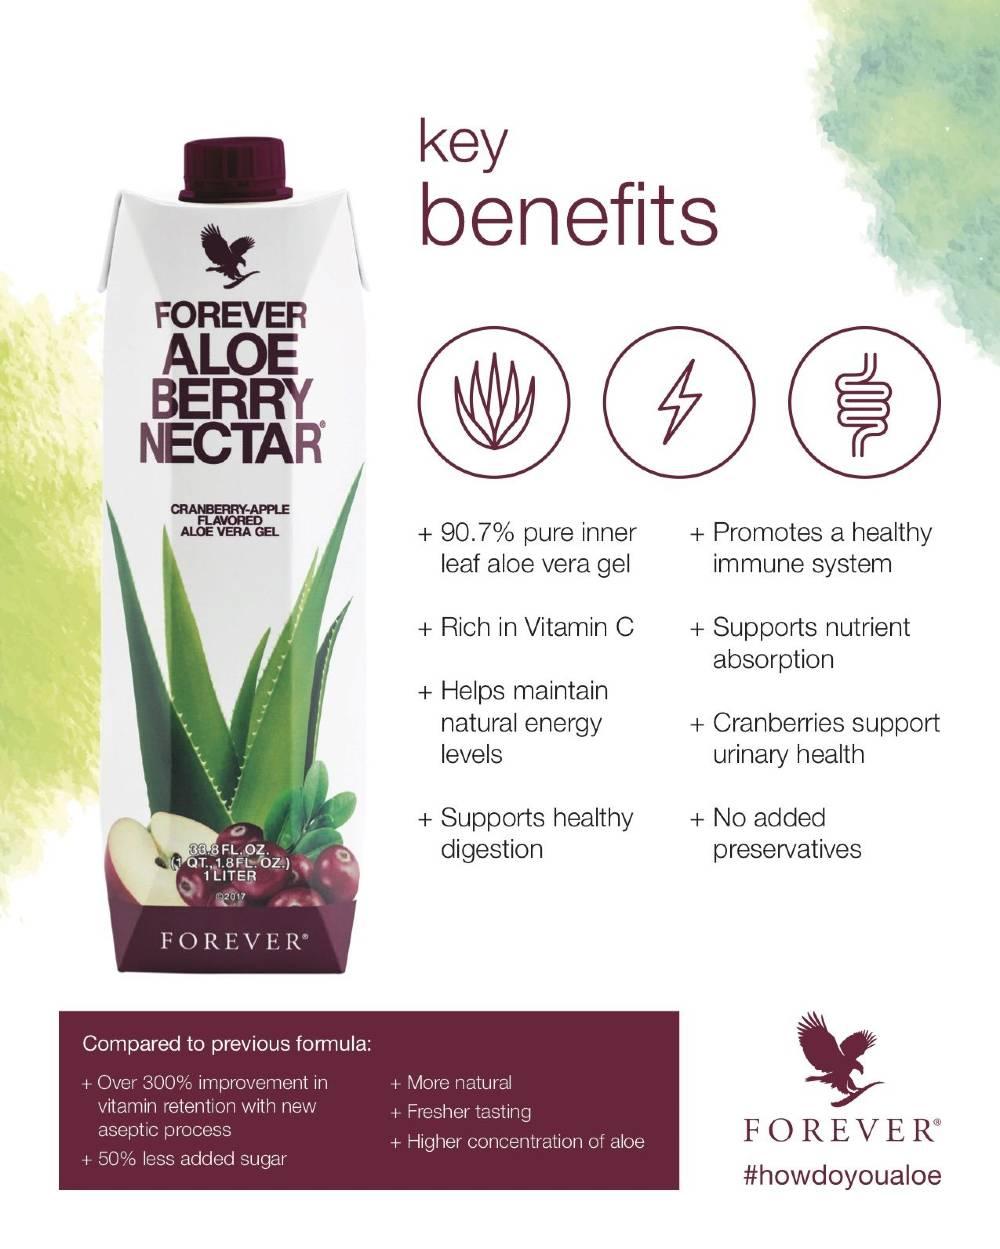 Forever Aloe Berry Nectar Benefits